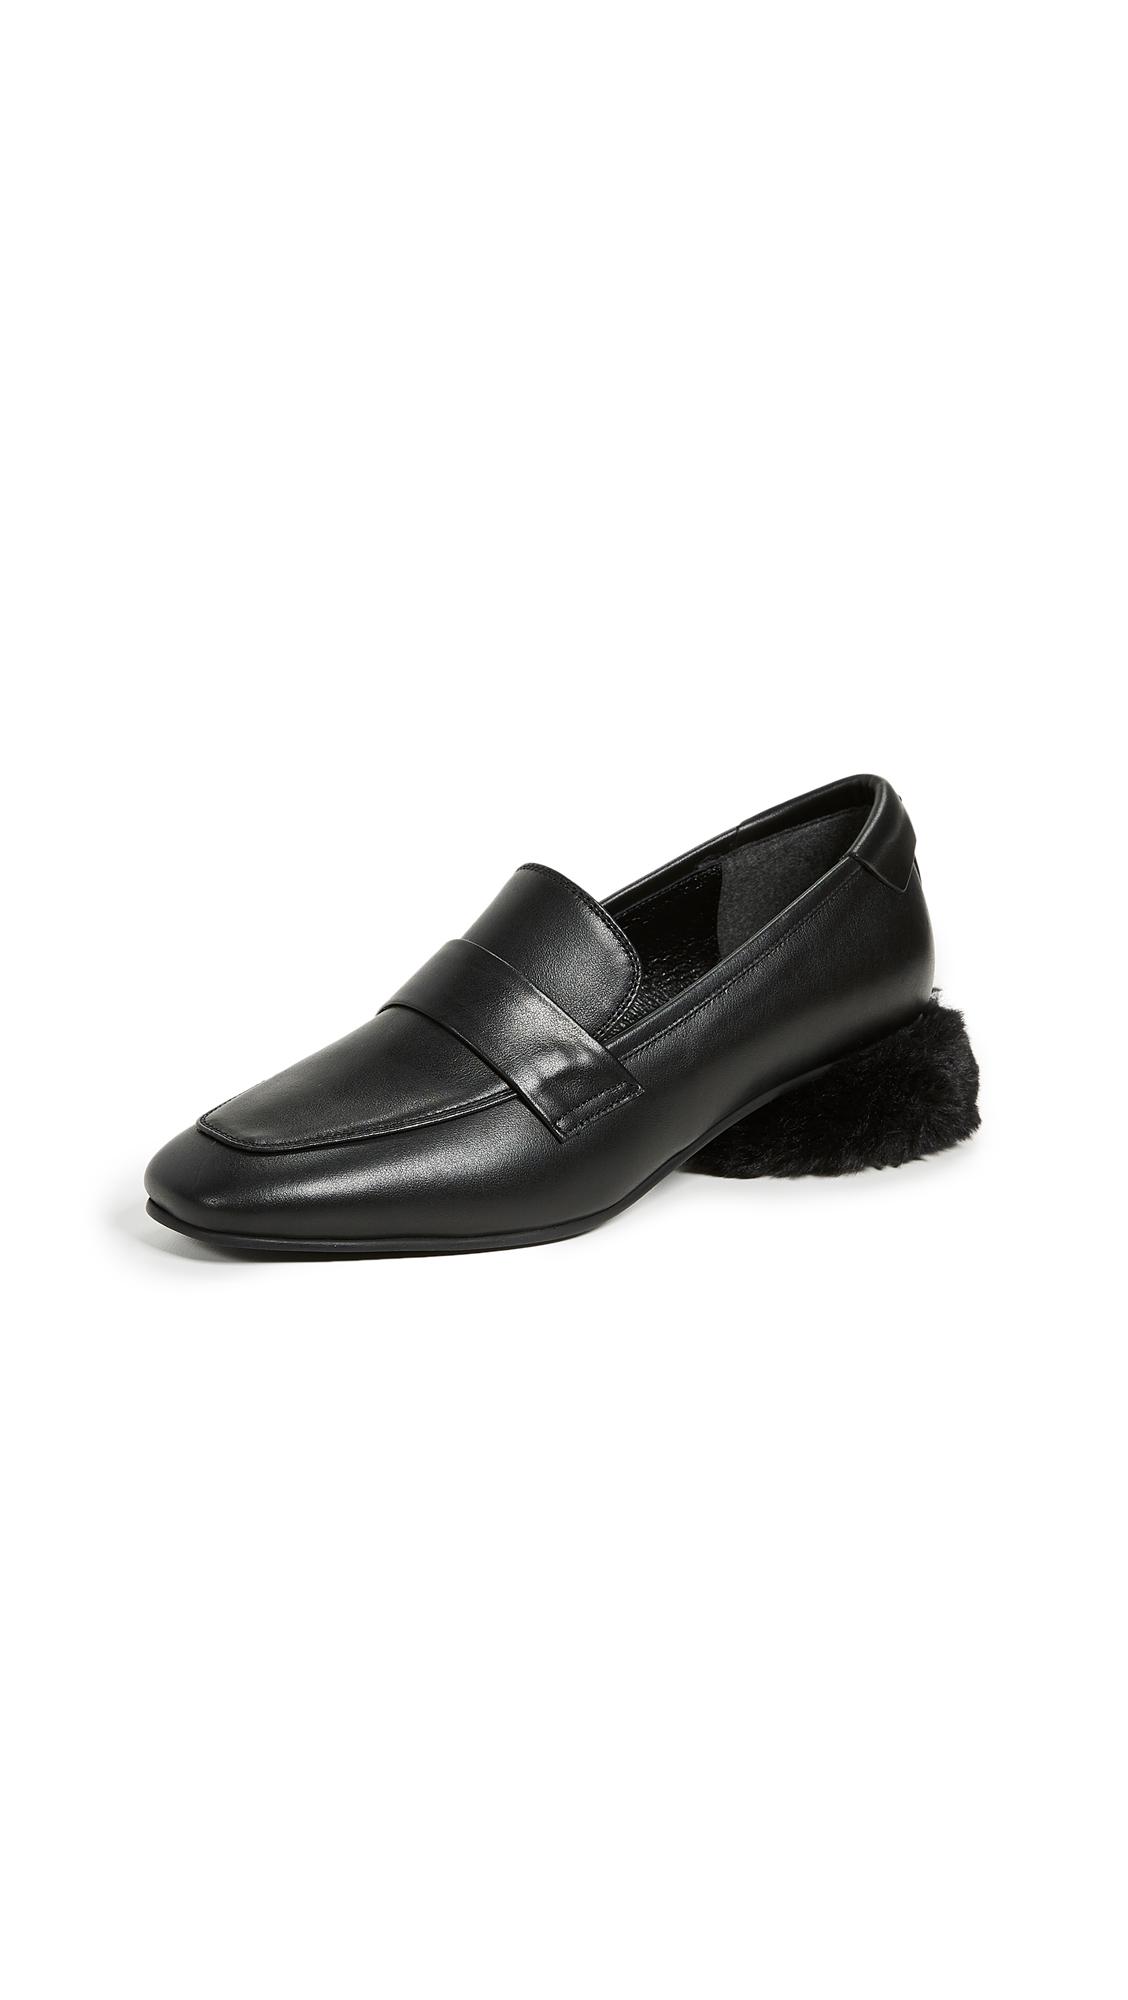 Reike Nen Moc Strap Loafers - Black